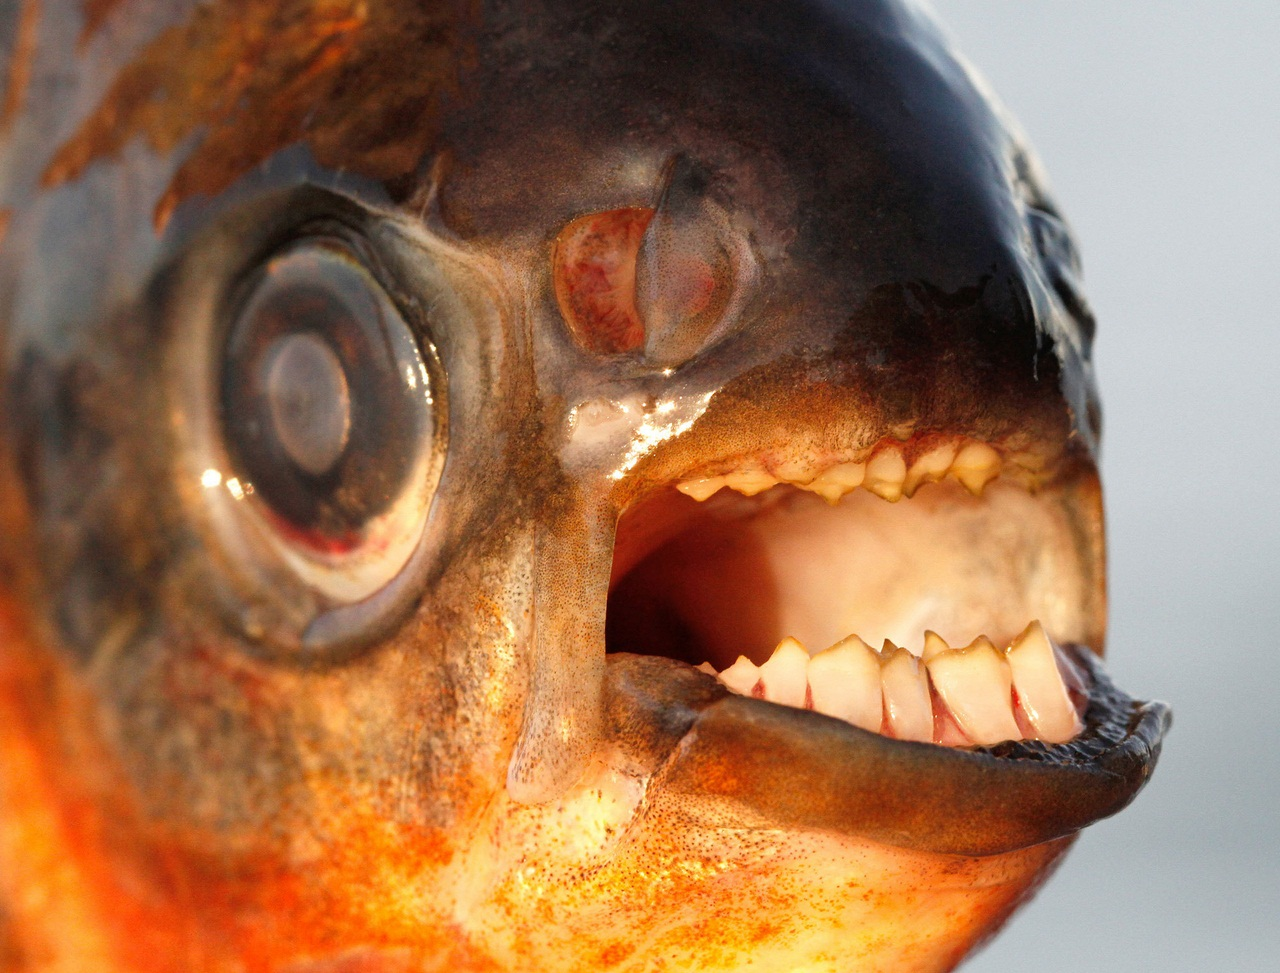 Рыба страшная с зубами